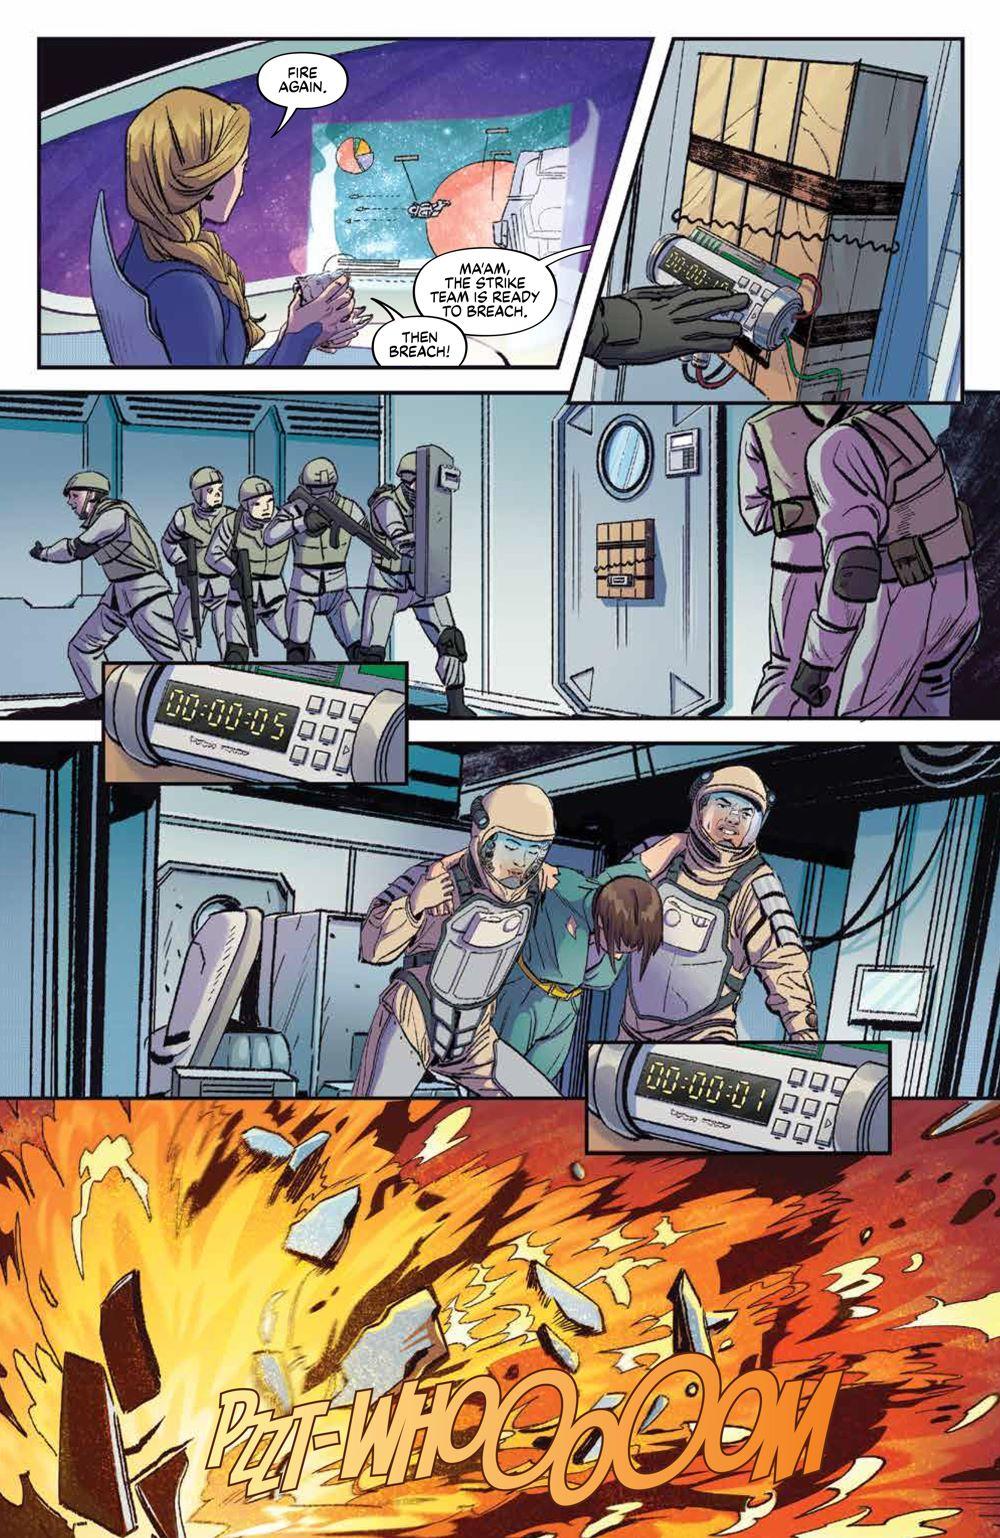 Firefly_BrandNewVerse_002_PRESS_8 ComicList Previews: FIREFLY A BRAND NEW 'VERSE #2 (OF 6)